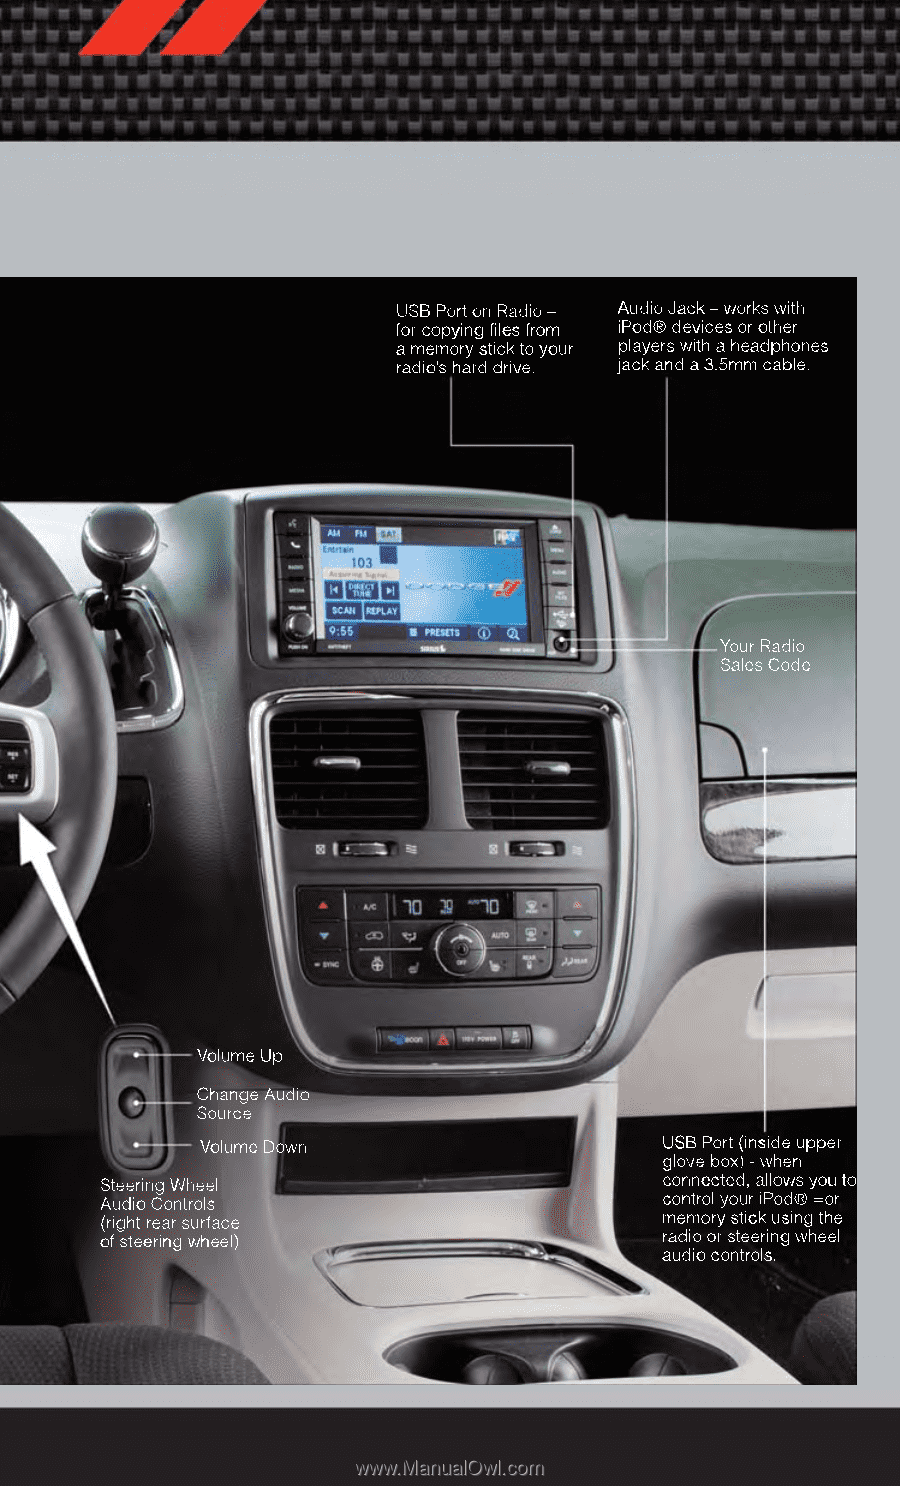 2012 Dodge Grand Caravan | User Guide - Page 33